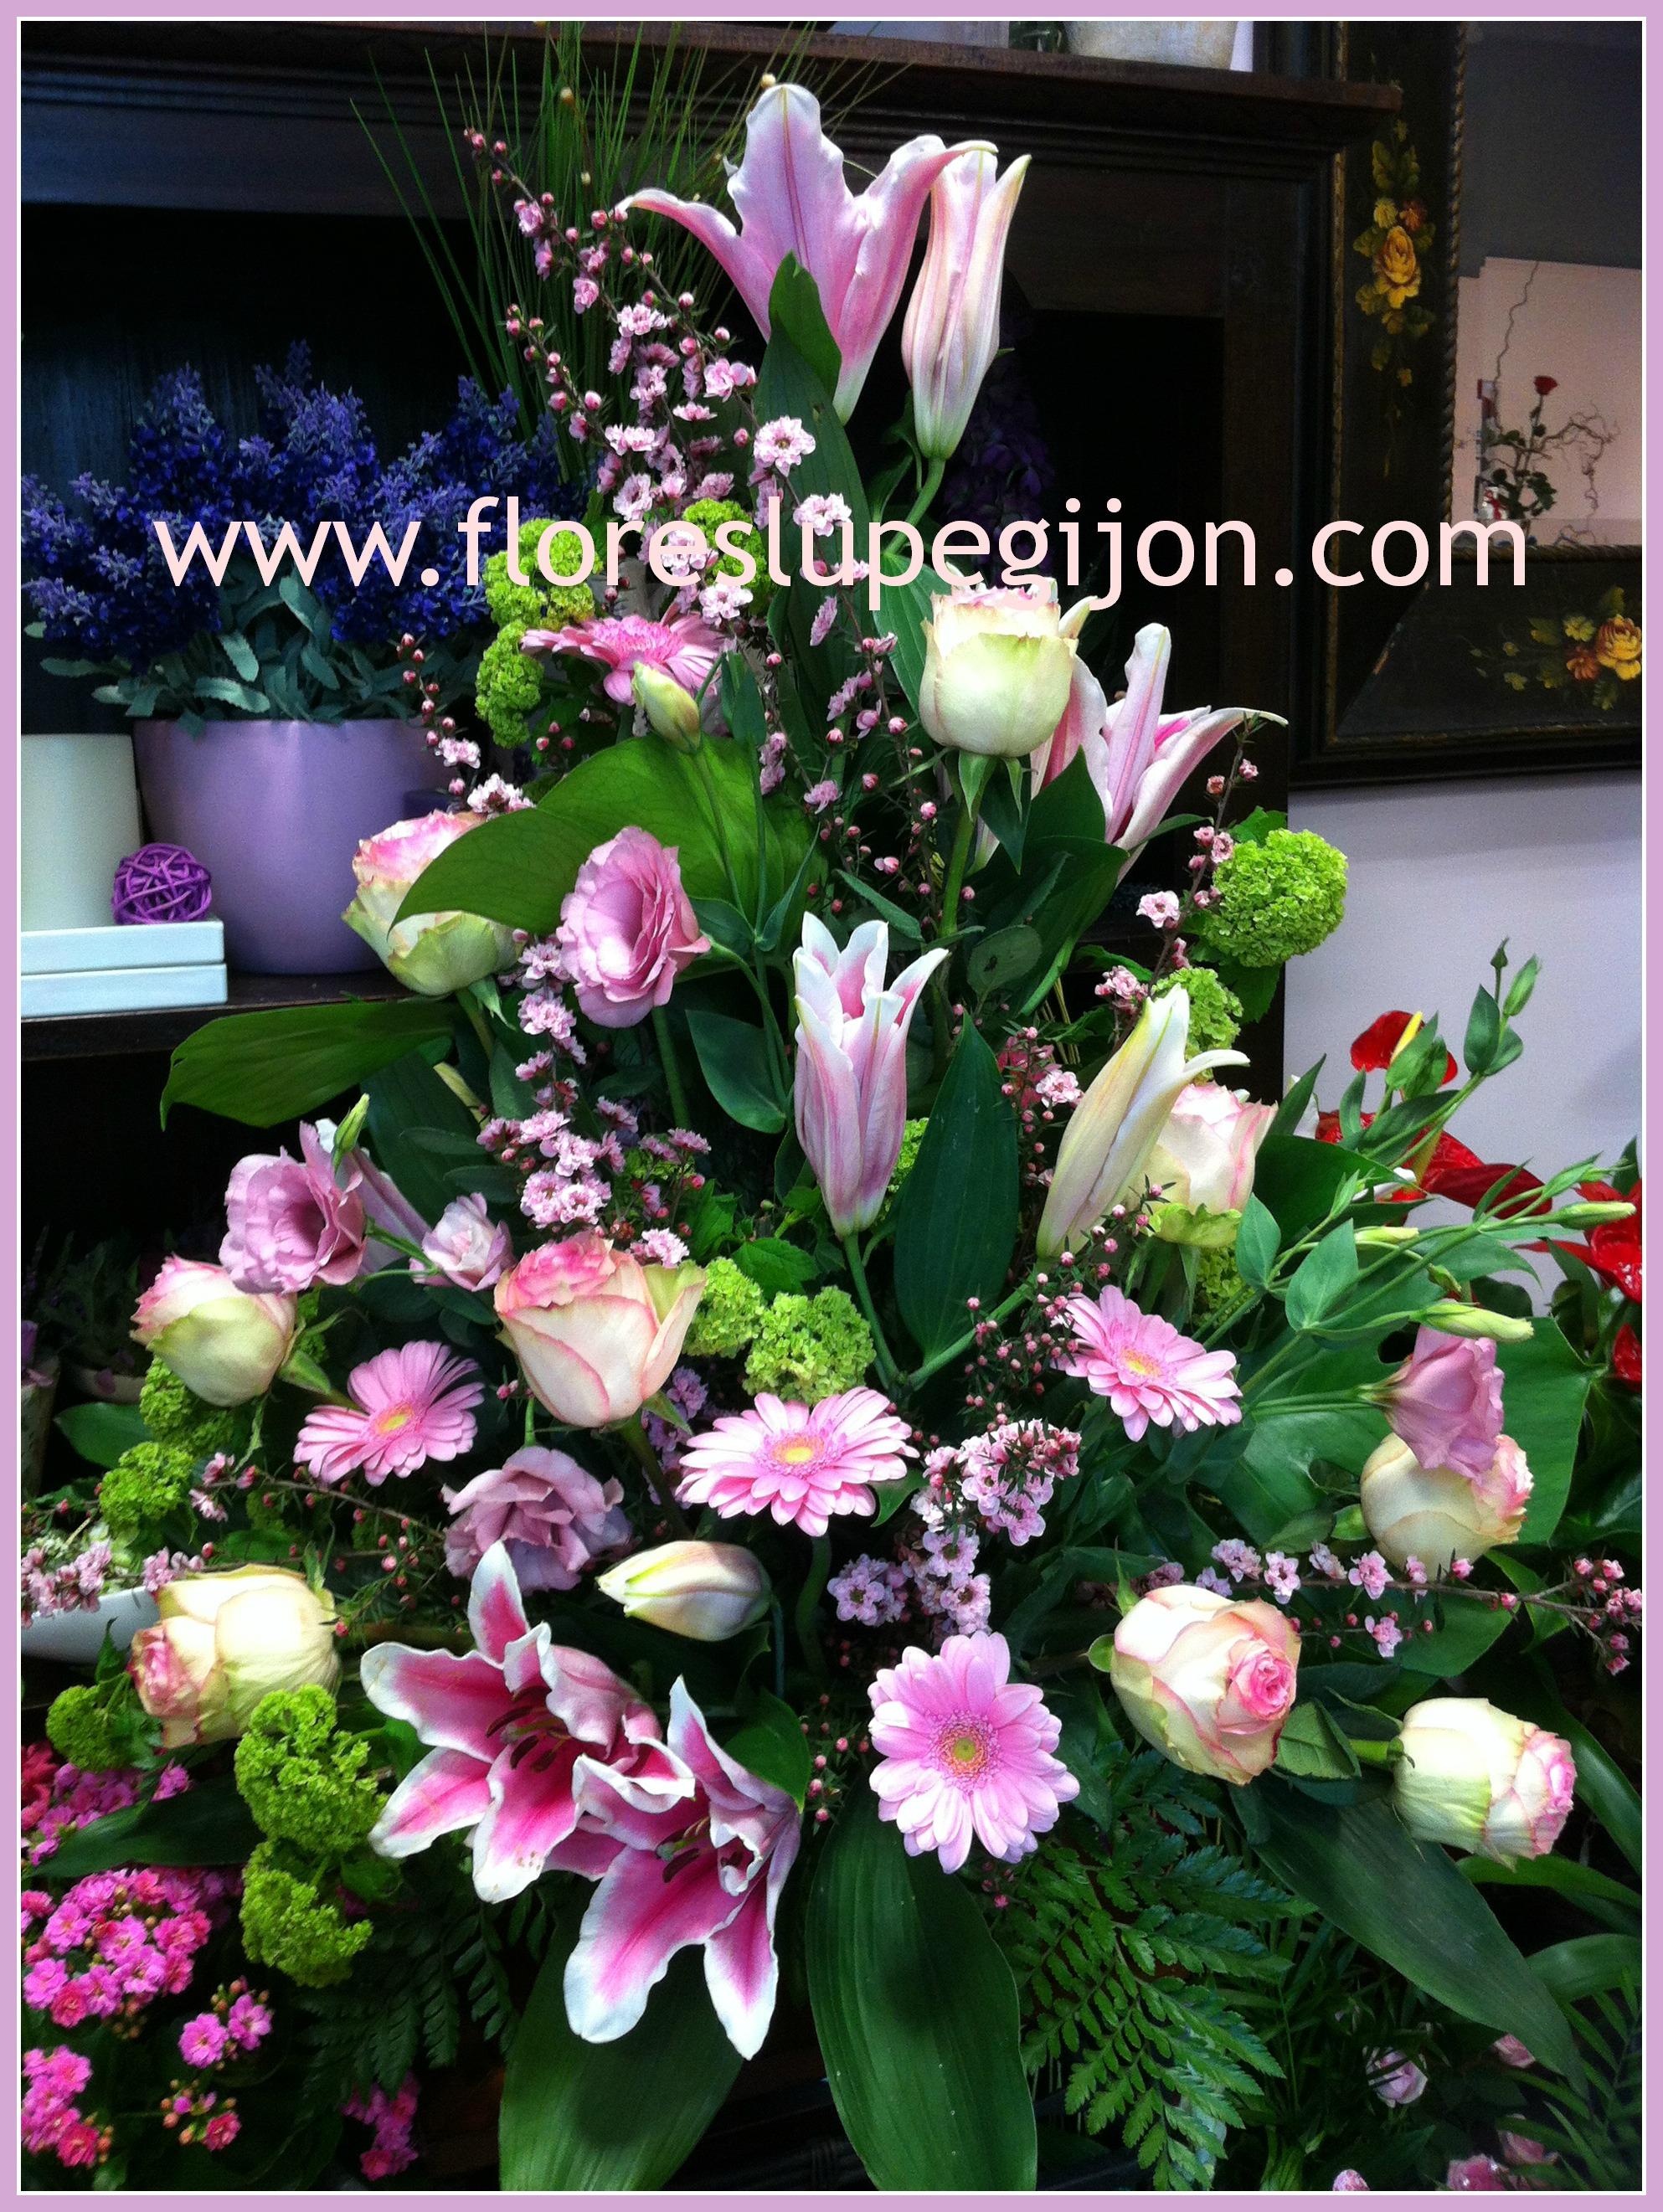 Centro vertical clásico con lilium, rosas, gerberas...